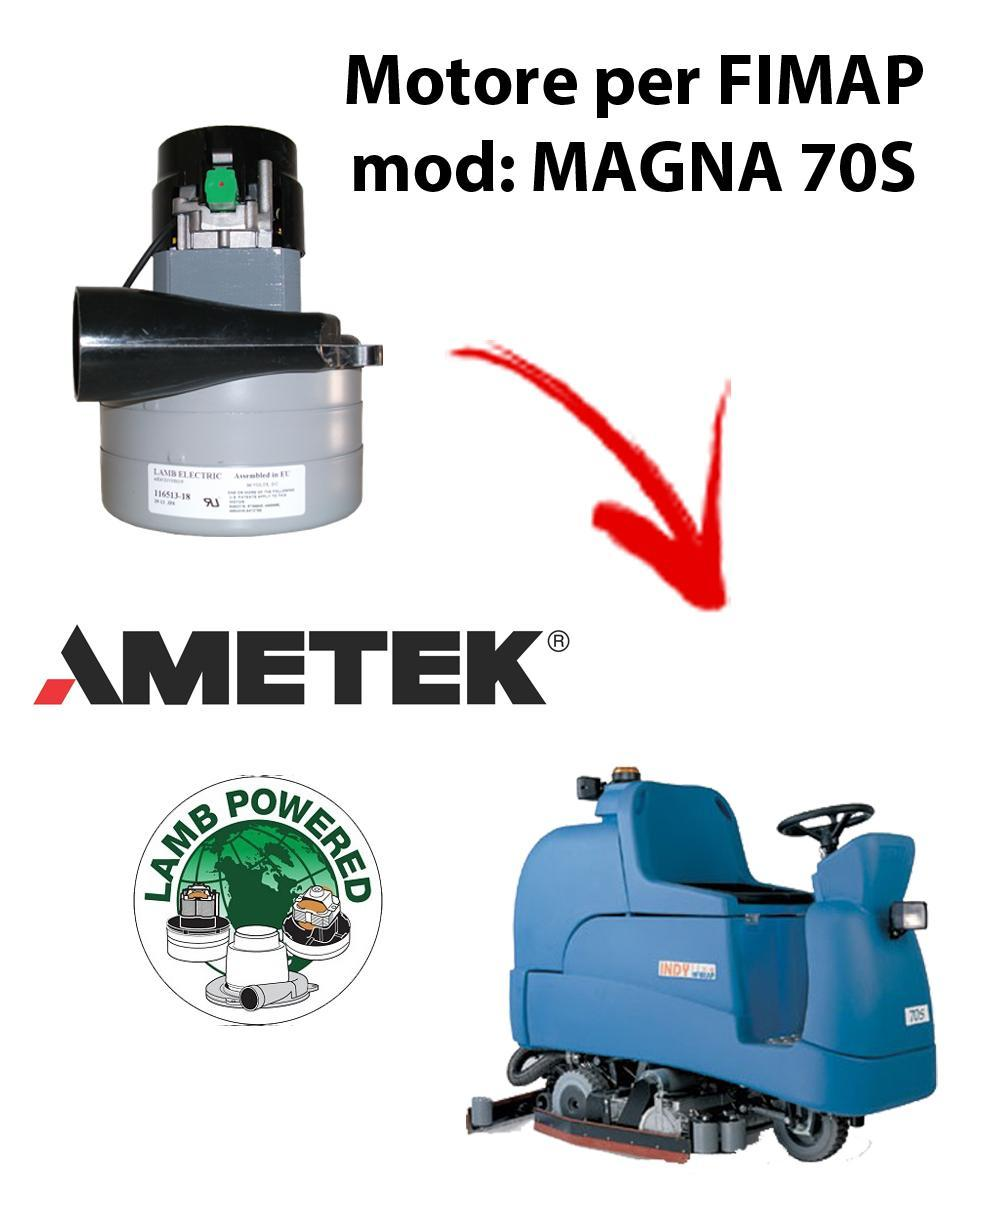 MAGNA 70S Saugmotor Ametek für scheuersaugmaschinen FIMAP